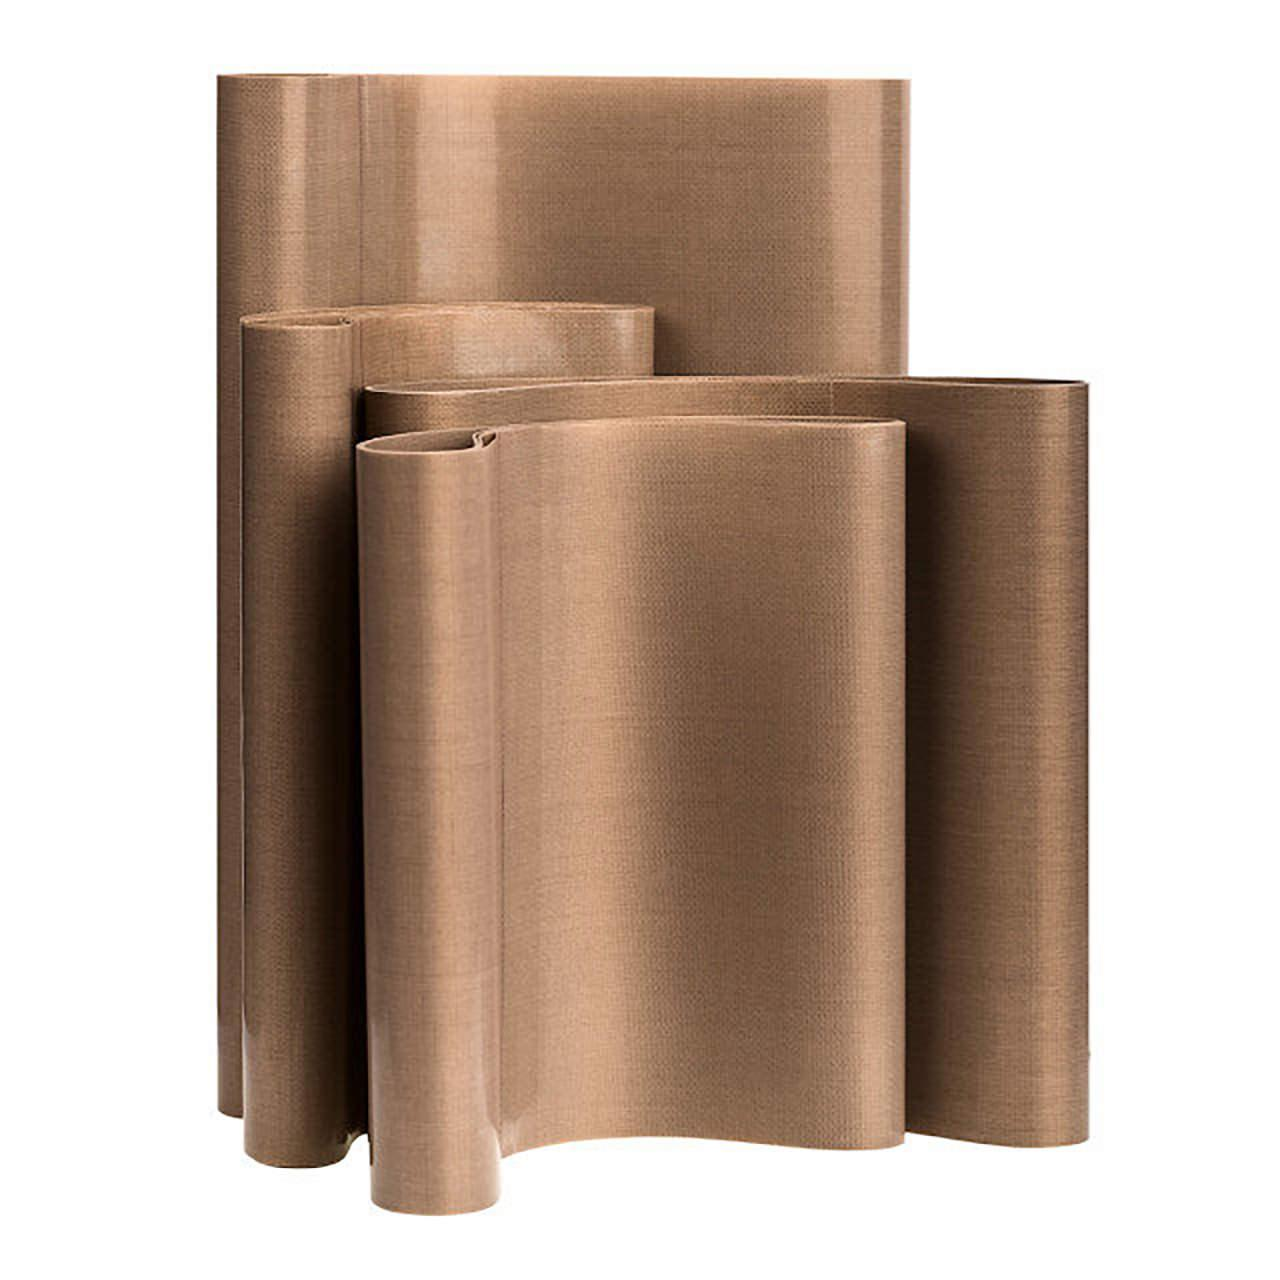 Тефлоновый ремень 230х528 мм для сварки ПВХ